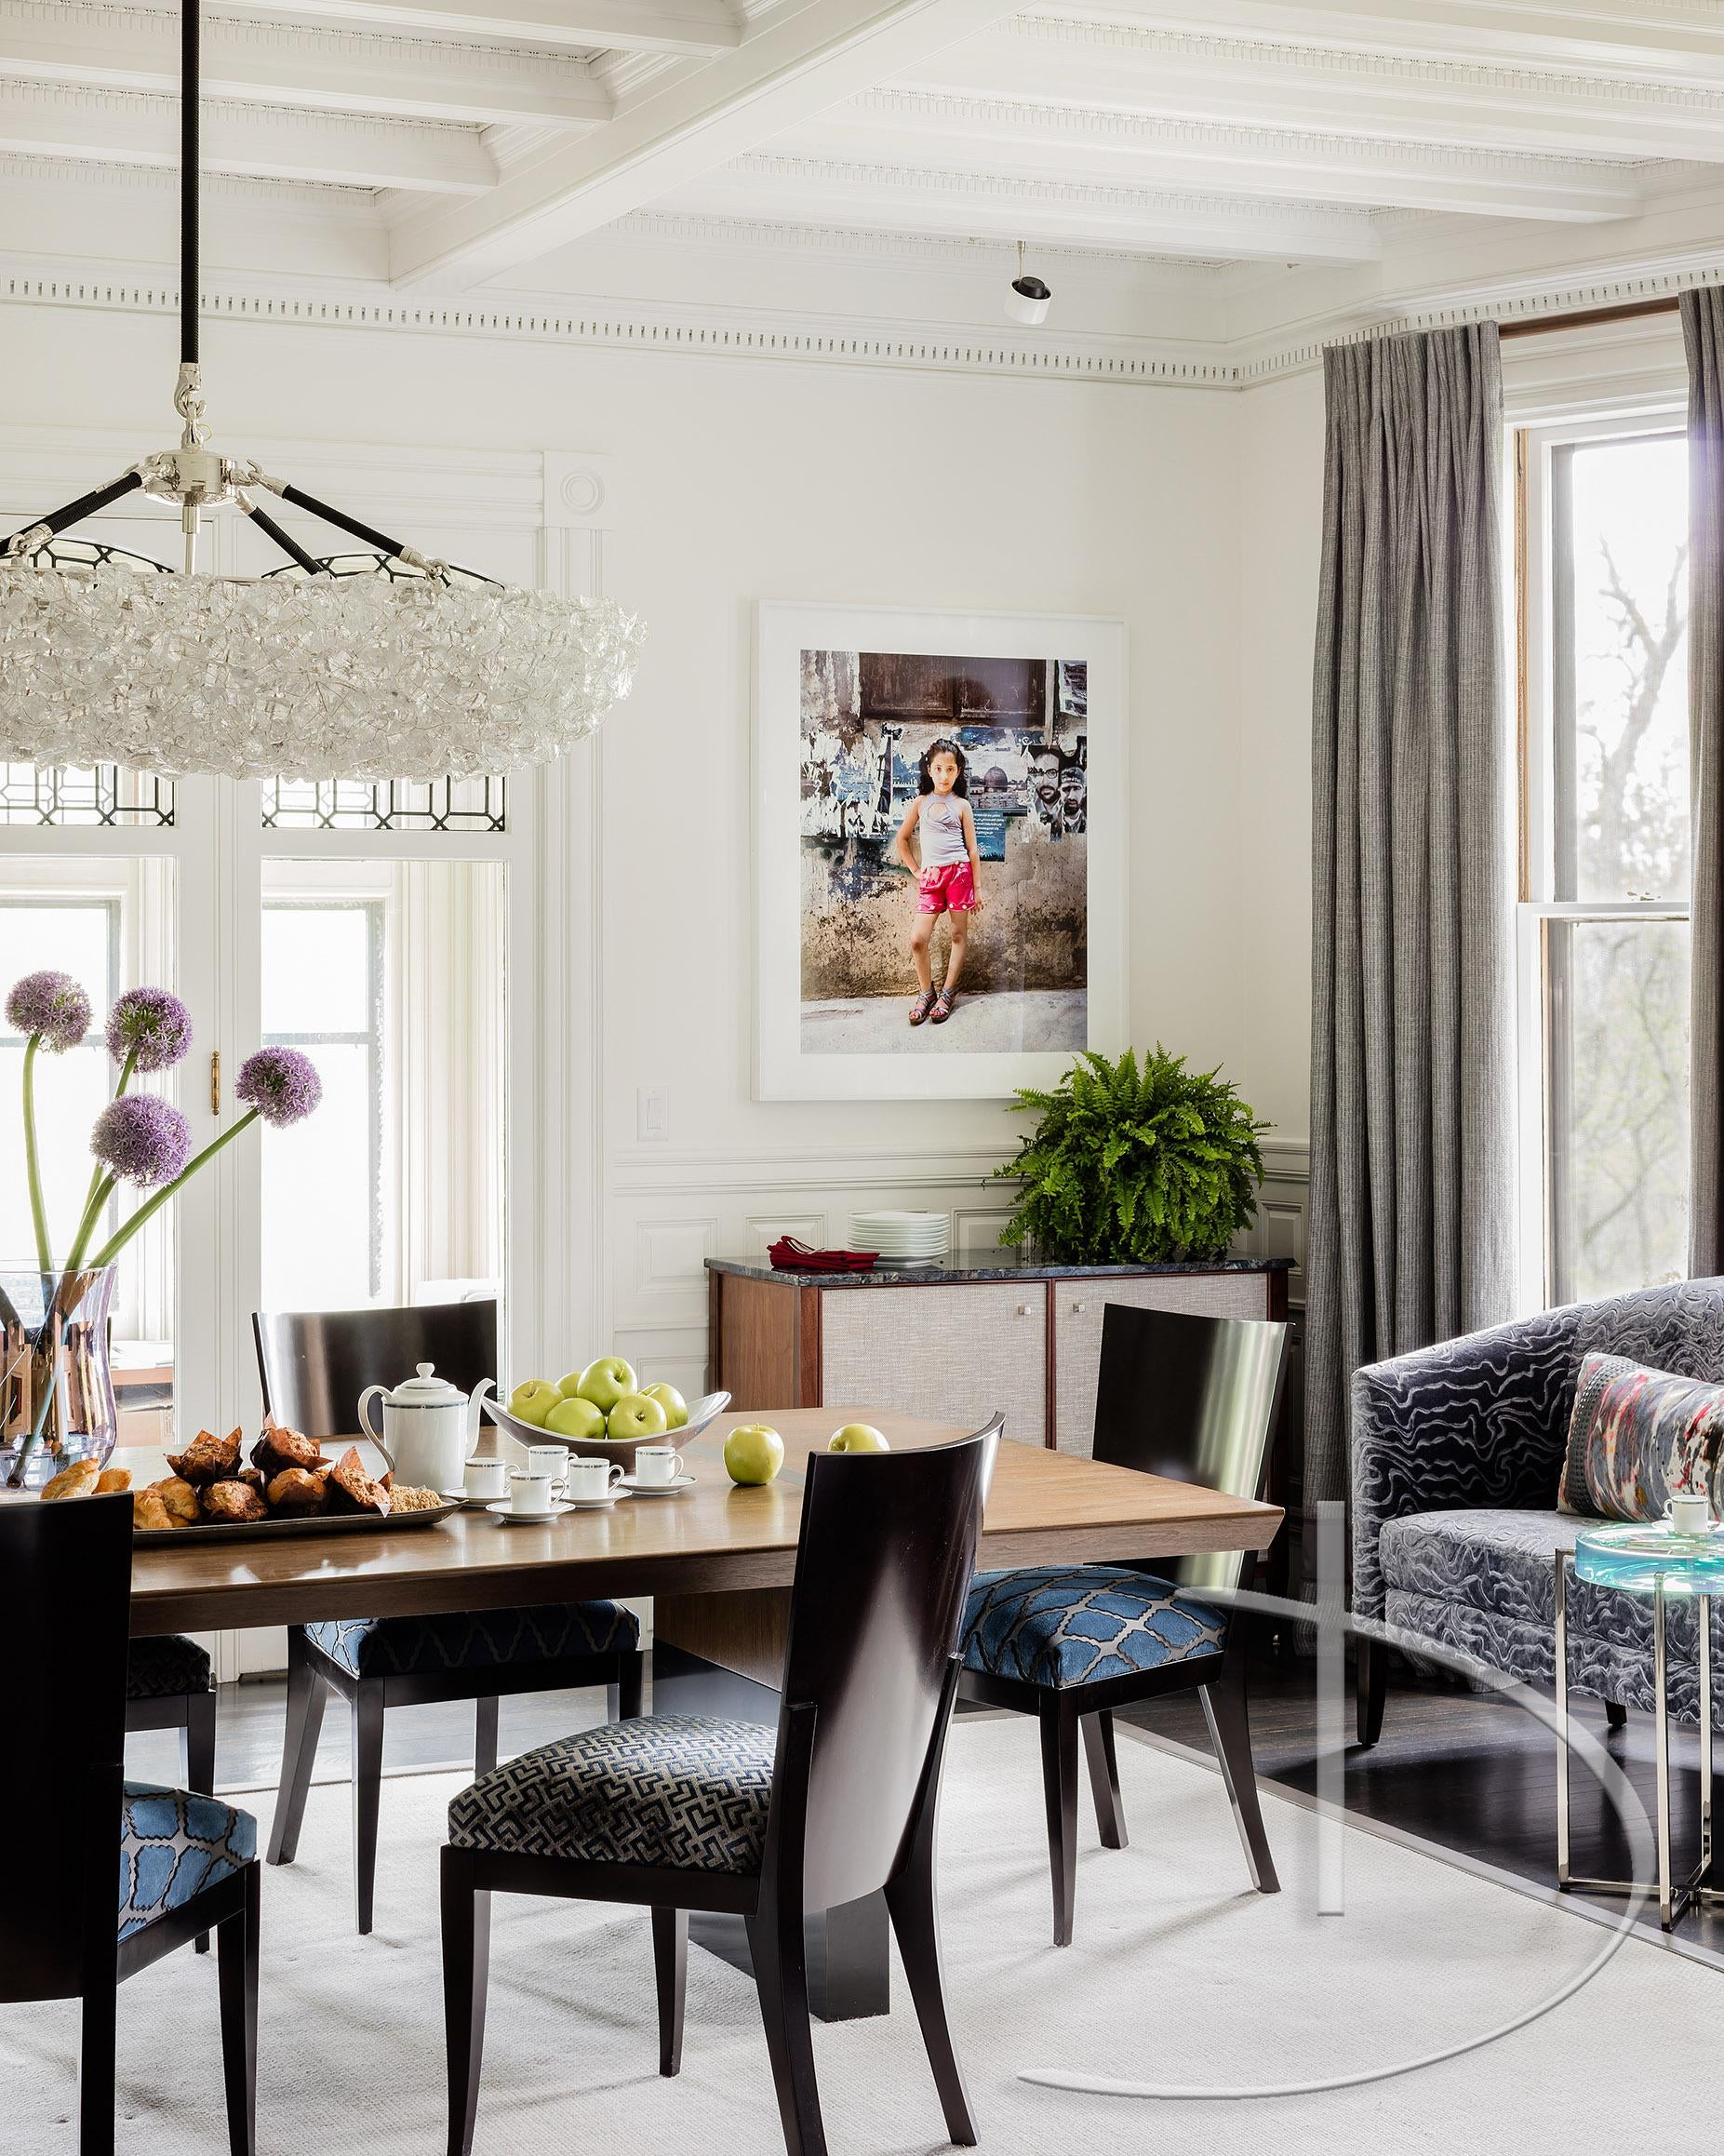 Genial 87509.daher.interior.design.portfolio.interiors.dining